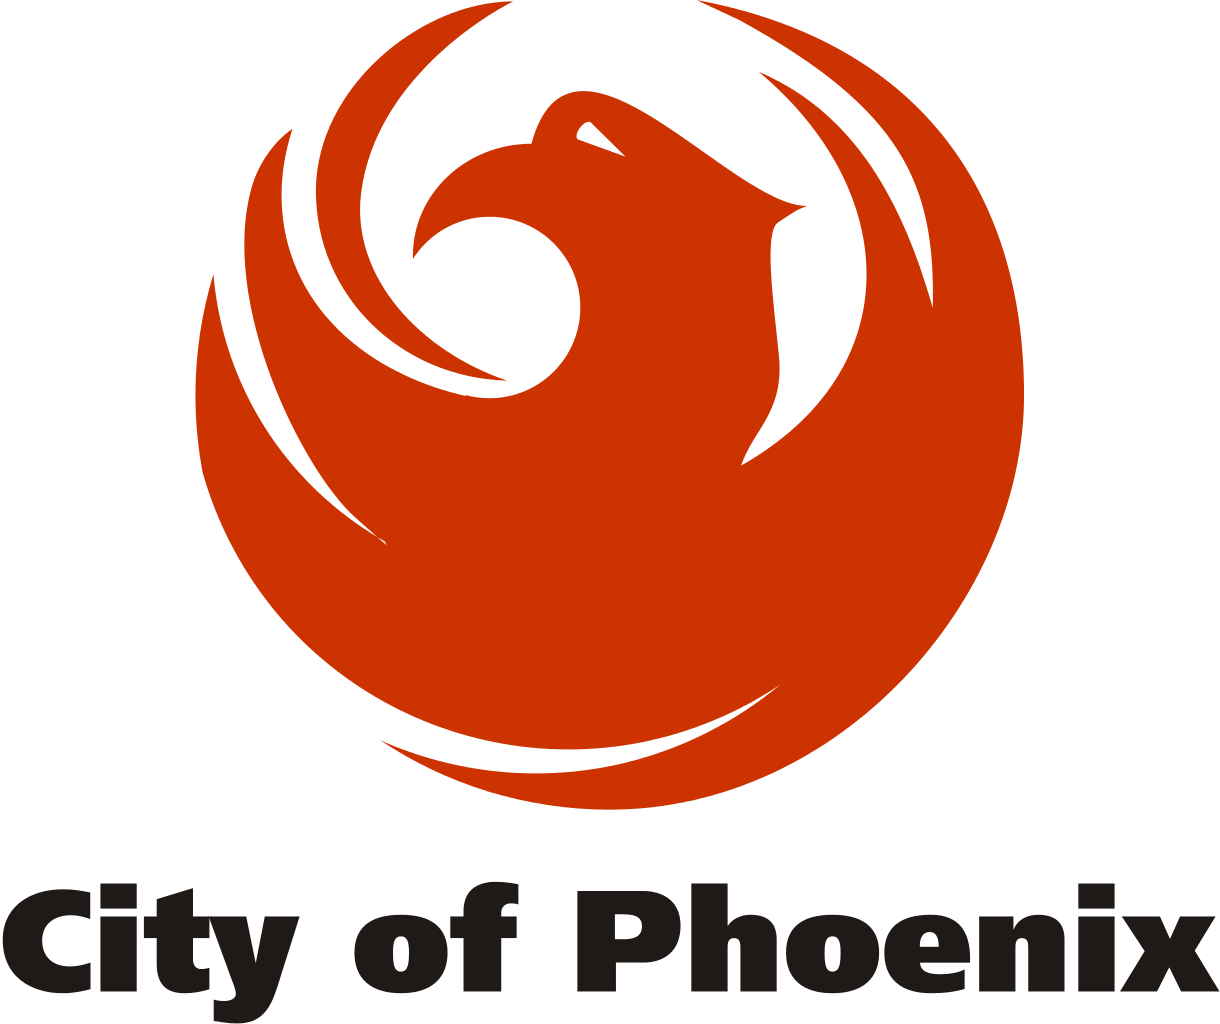 graphic free phoenix svg logo #114997913